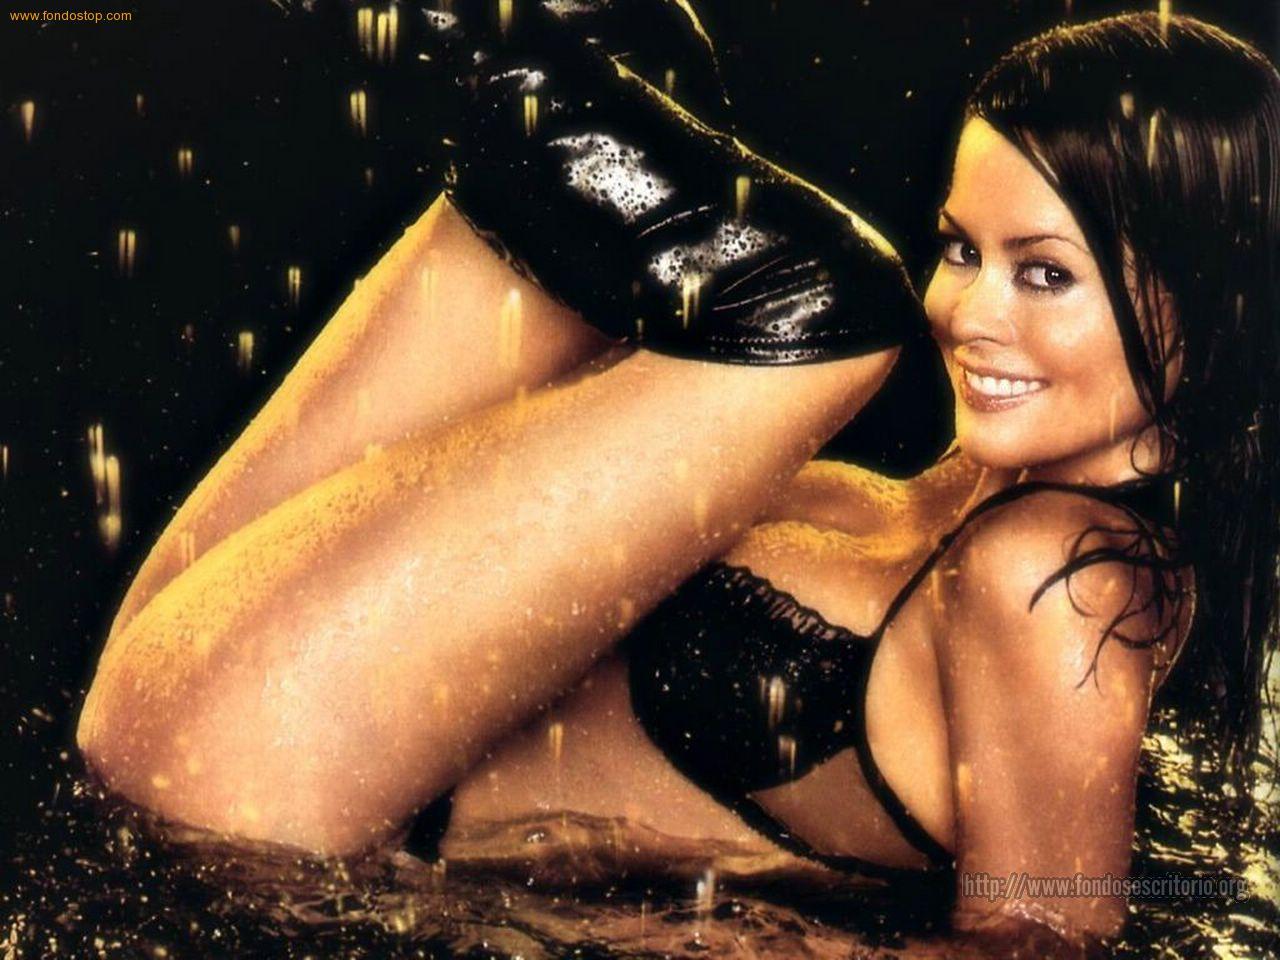 http://2.bp.blogspot.com/-tSzicsoDQx0/ToAv41RII0I/AAAAAAAAShk/IQJTYox3zBI/s1600/Brooke-Burke-06-1.jpeg